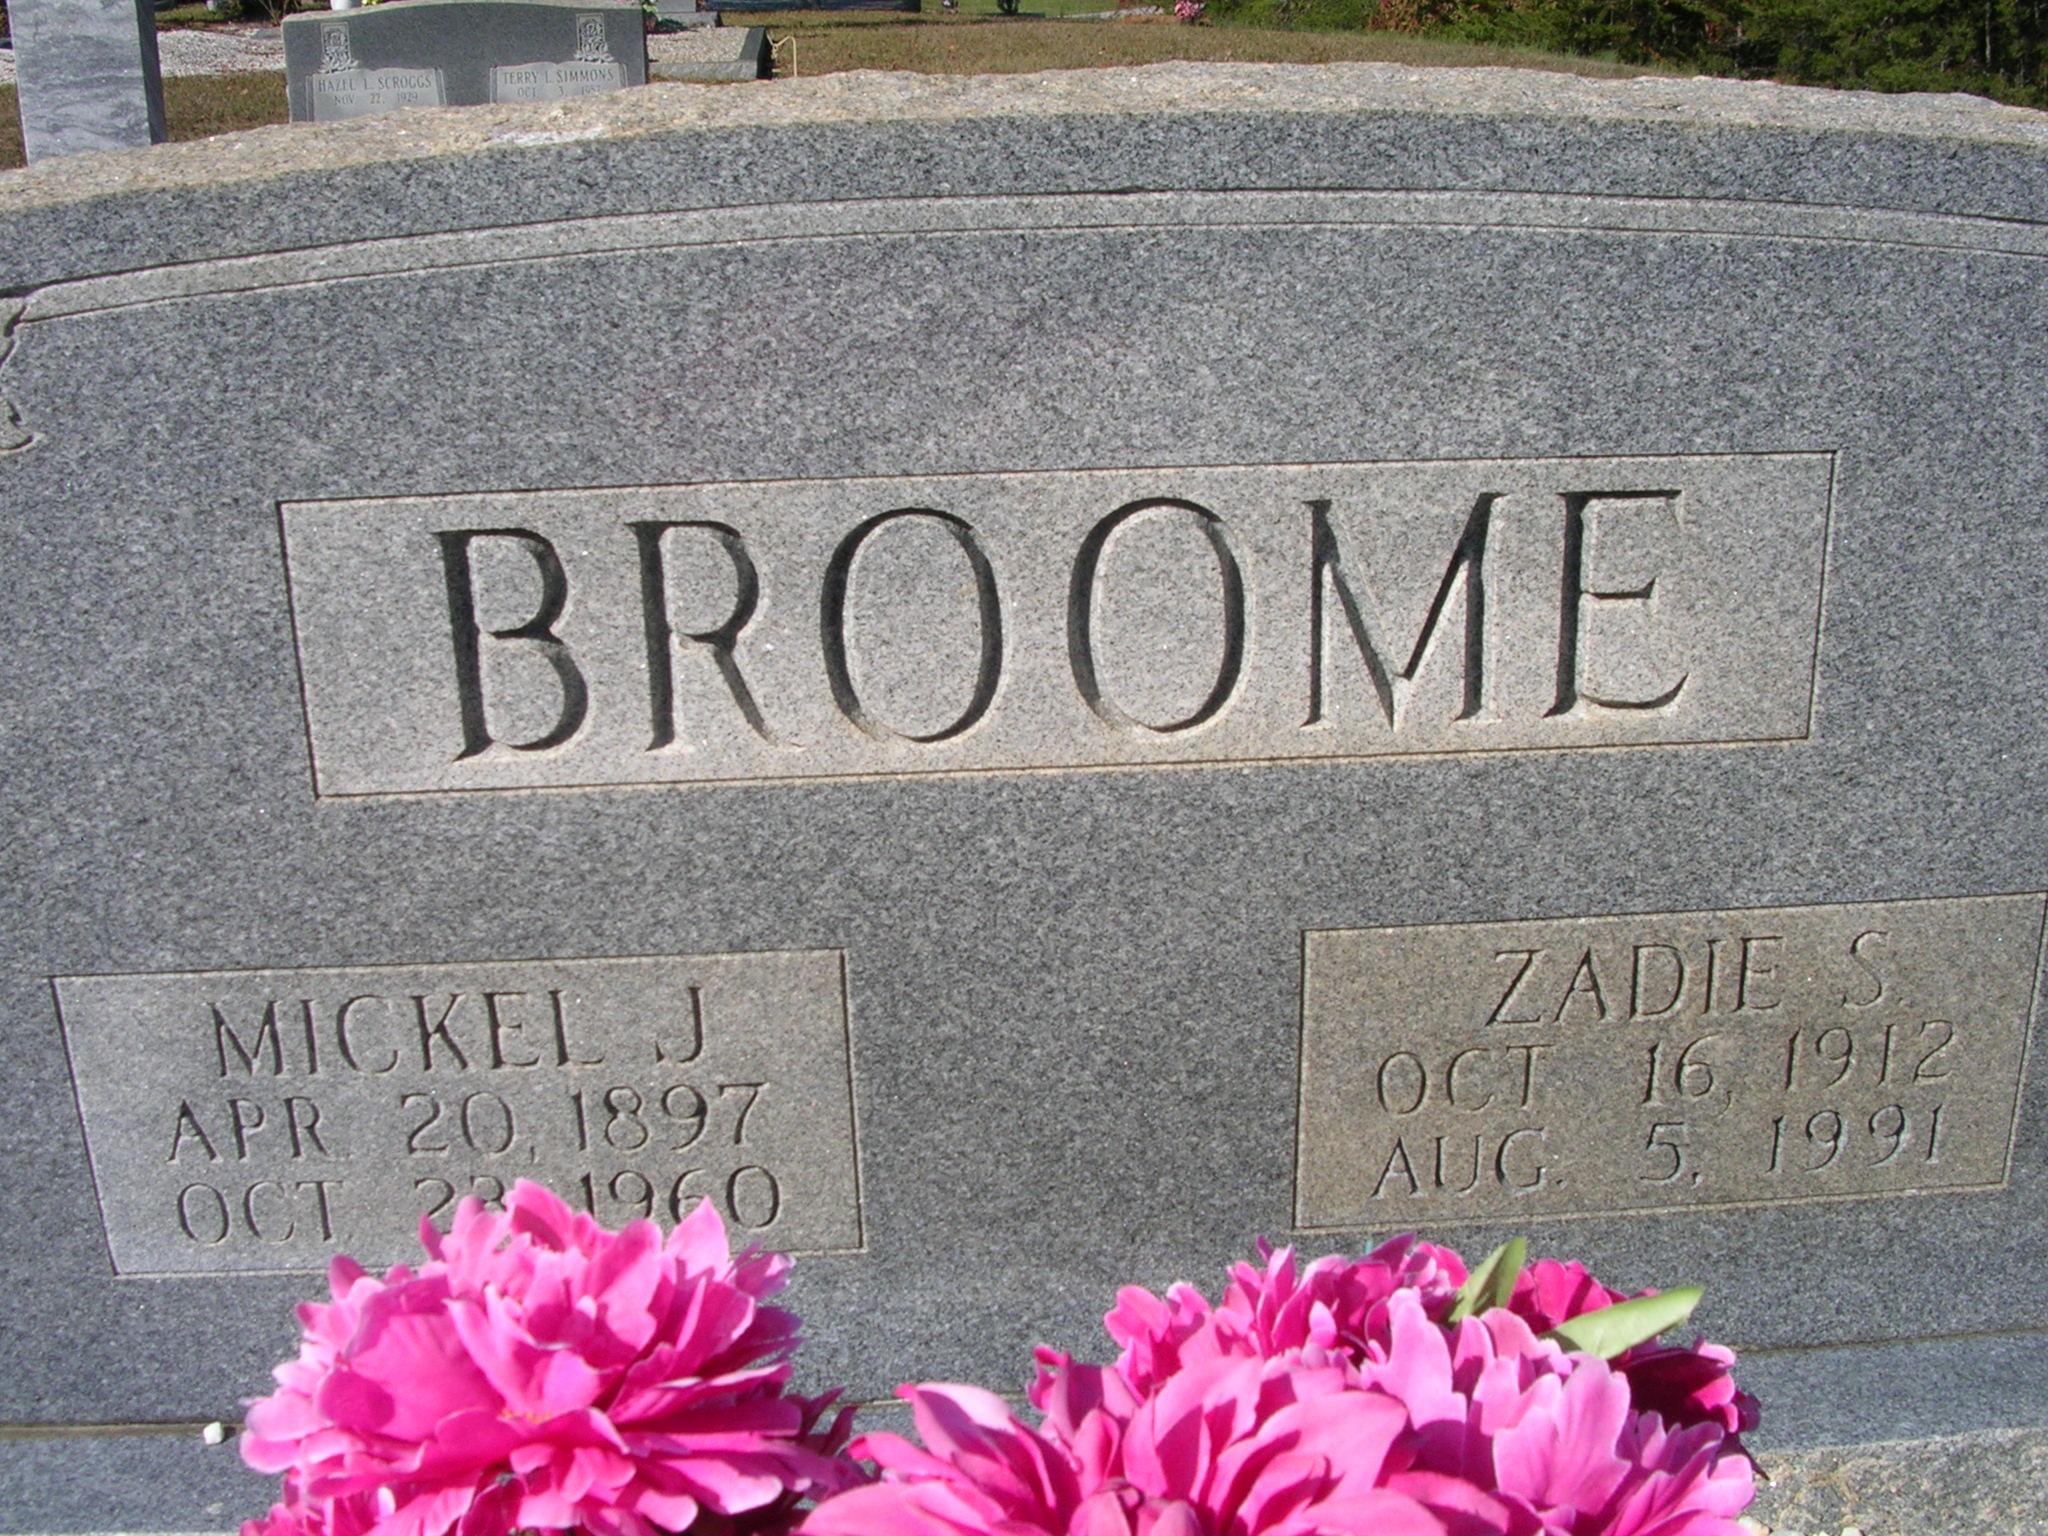 Michael Jackson Broome